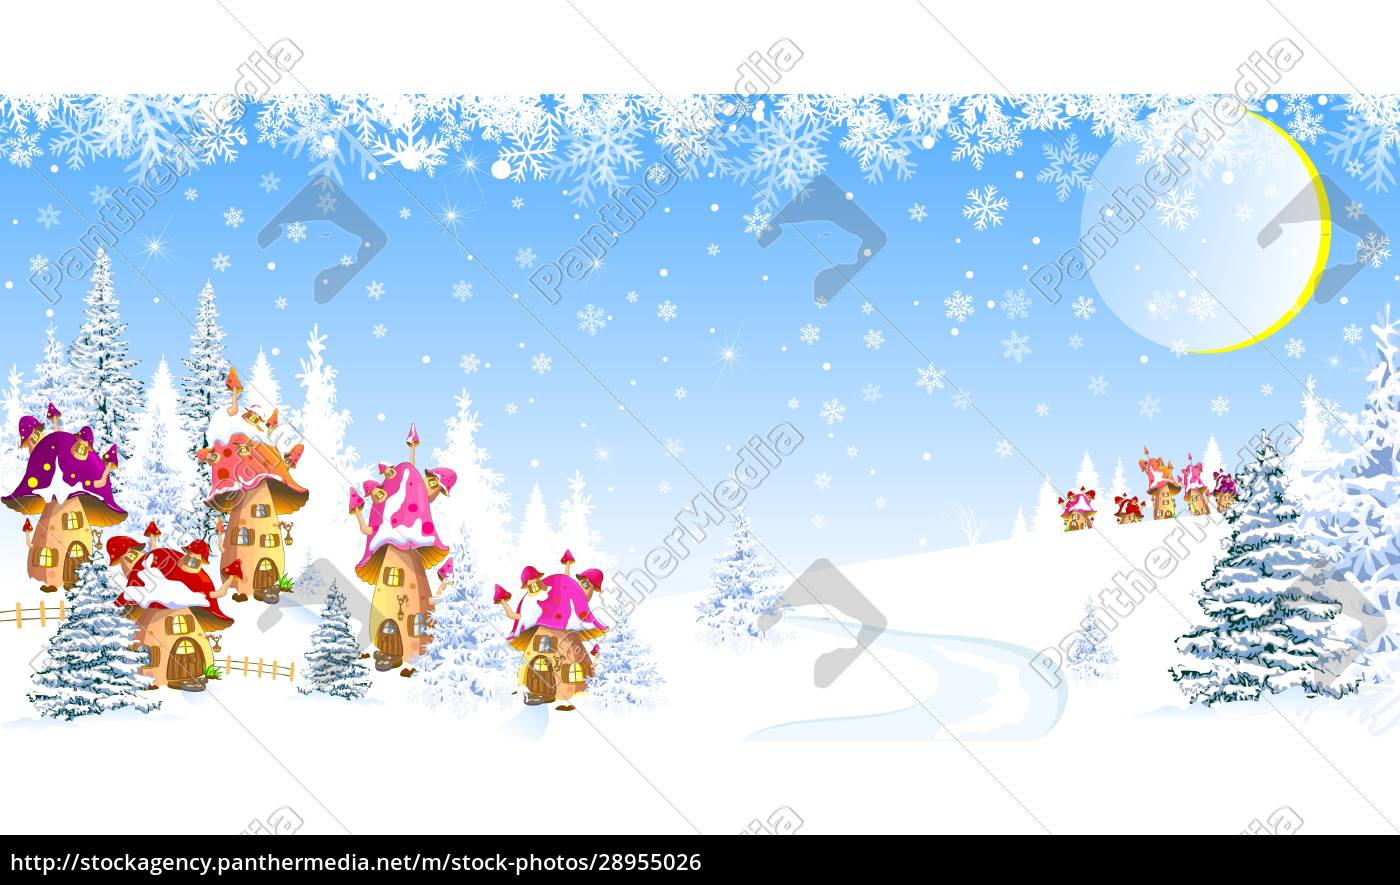 mushroom, houses, winter, forest, snow - 28955026